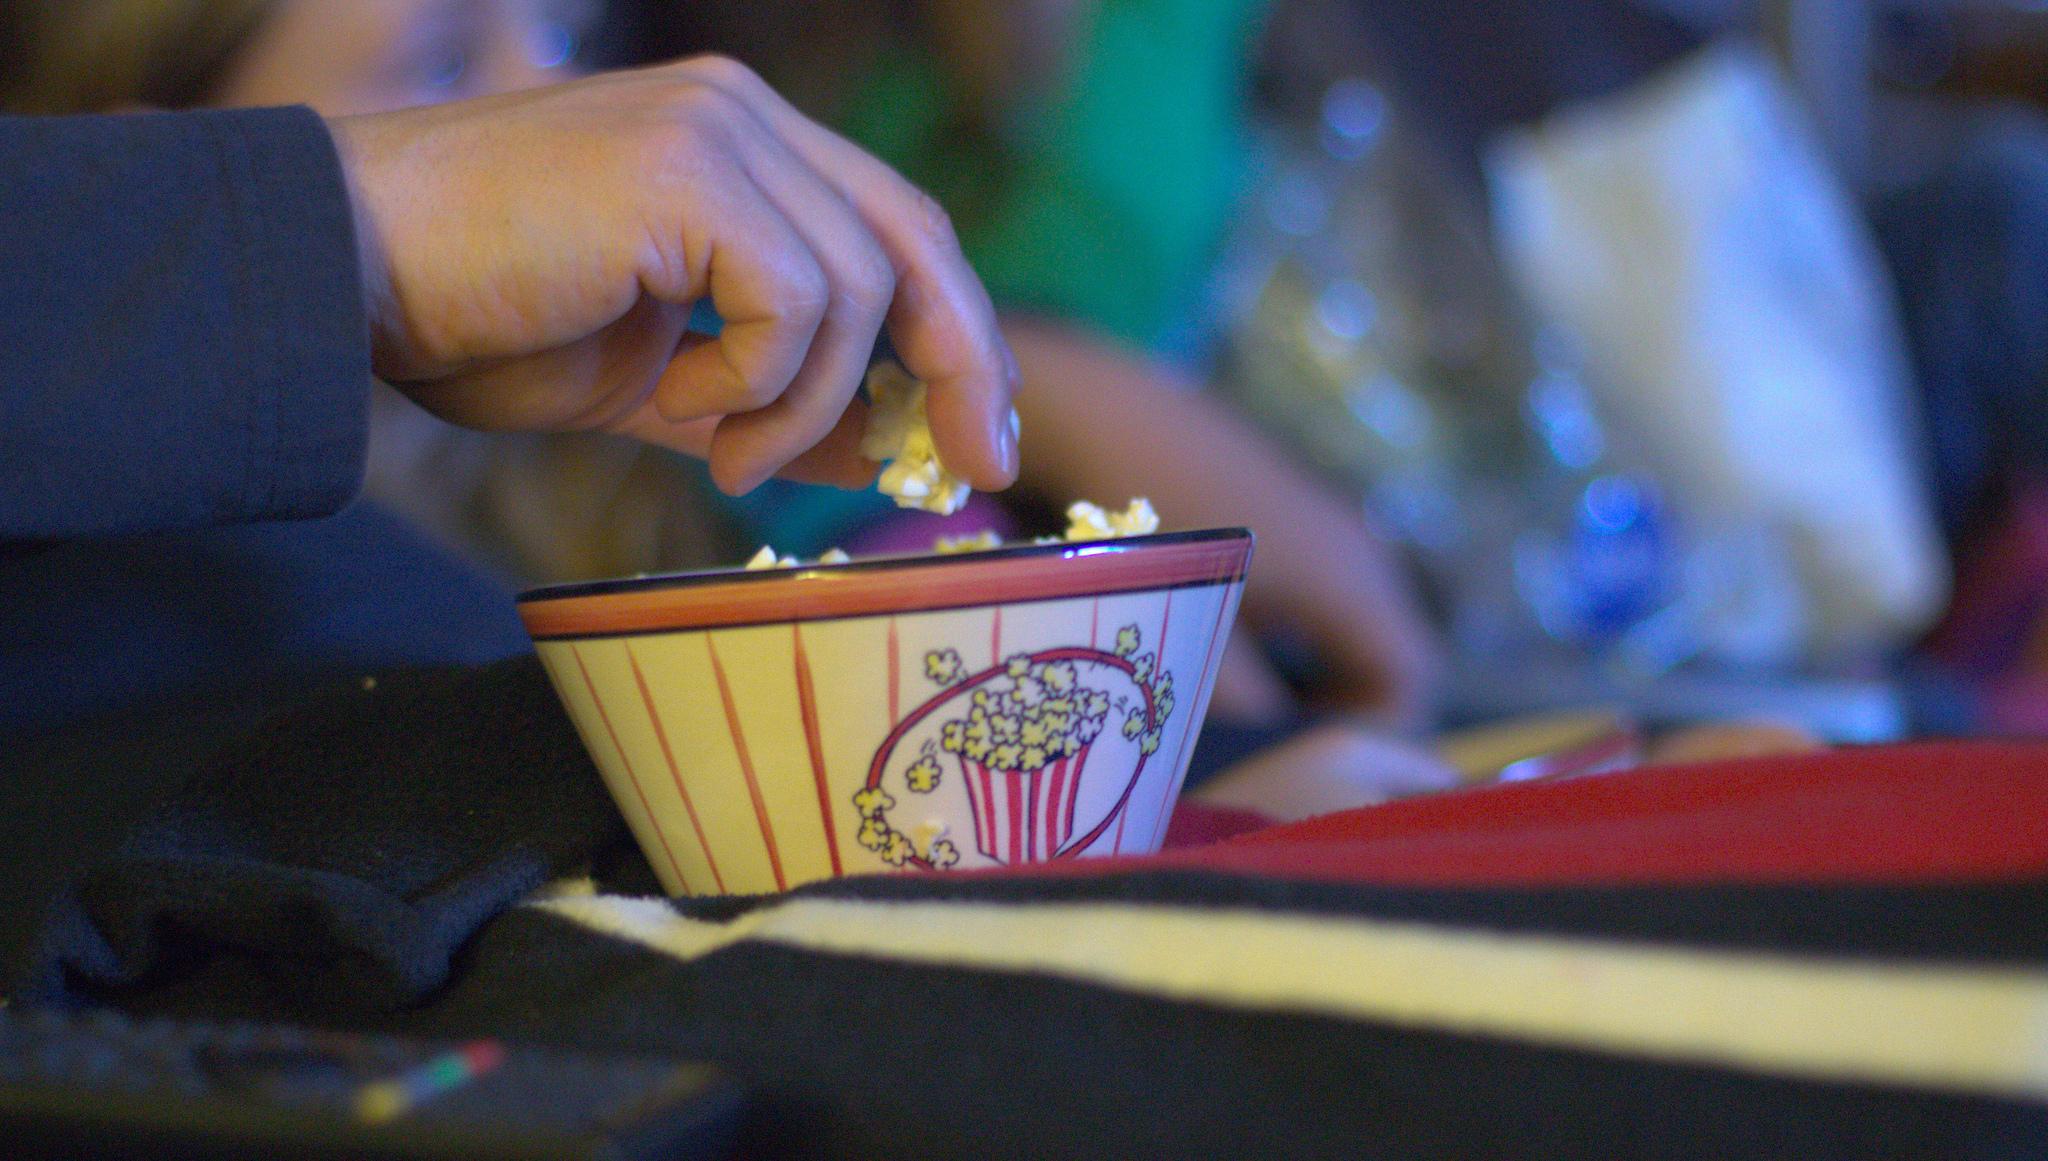 Películas para niños que refuerzan valores positivos